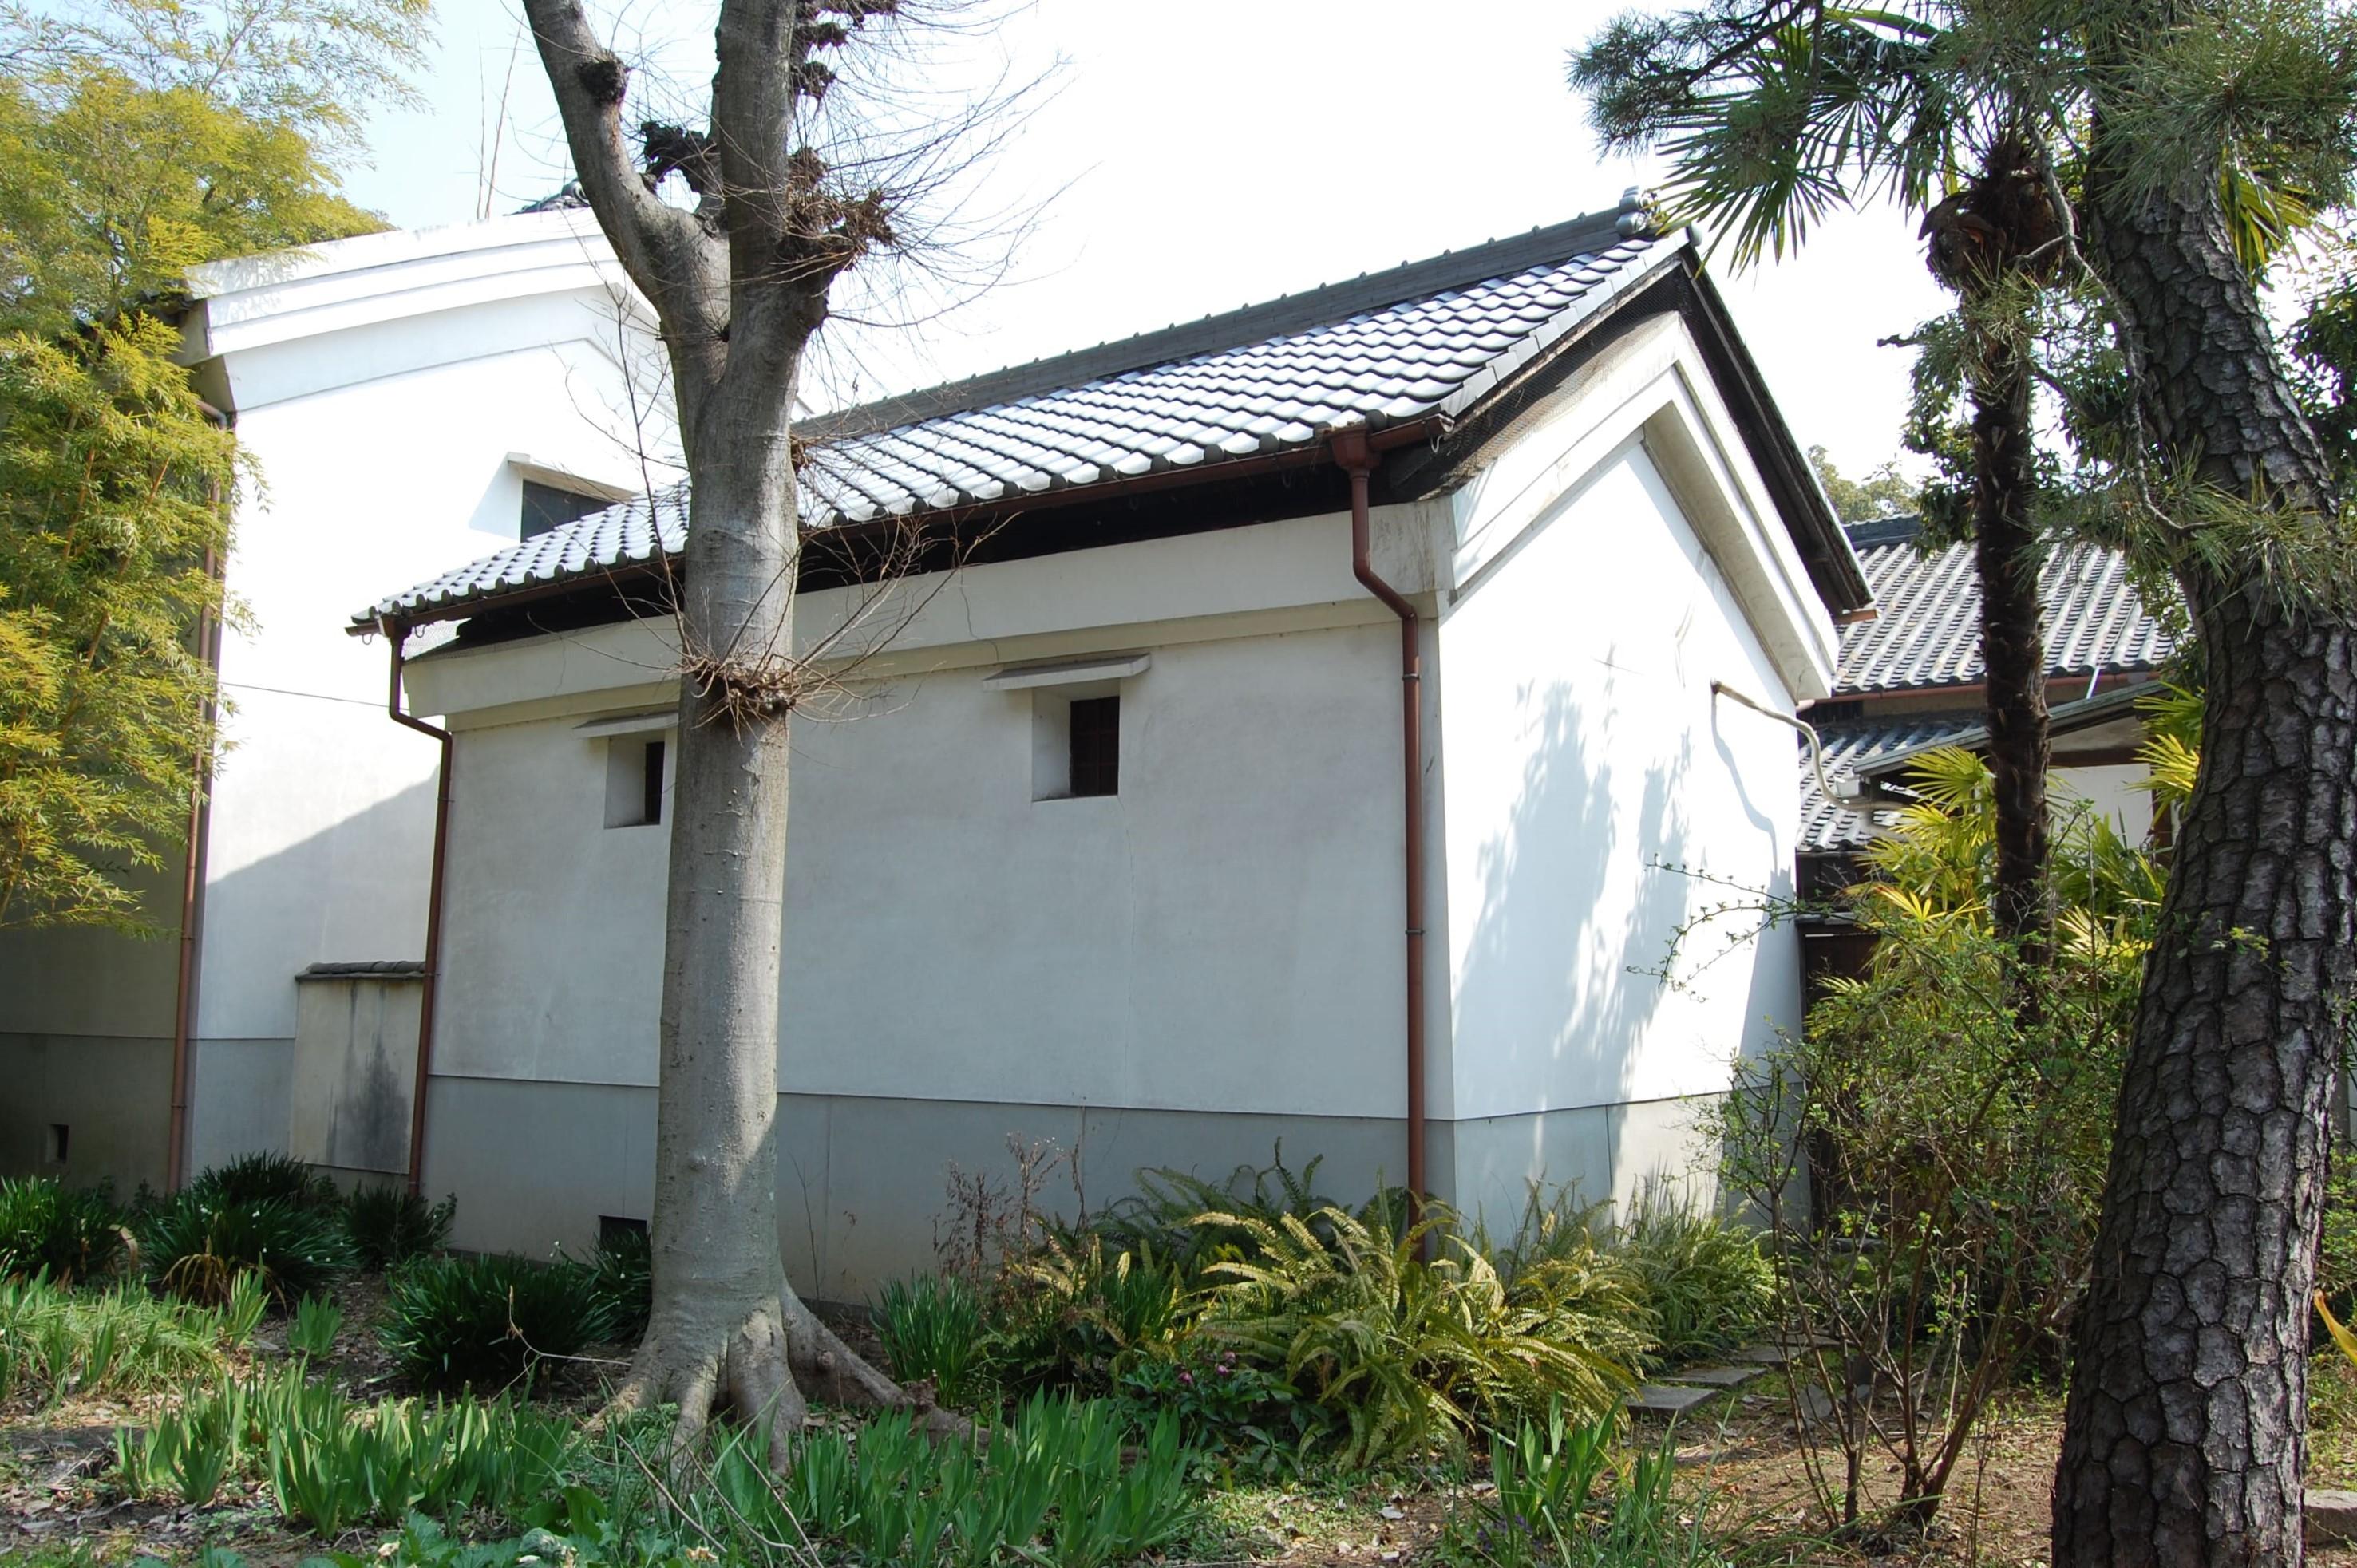 <p>備窮倉</p>飢餓対策として建設された貯穀倉で、近世村落における社会事業を物語る遺構である。